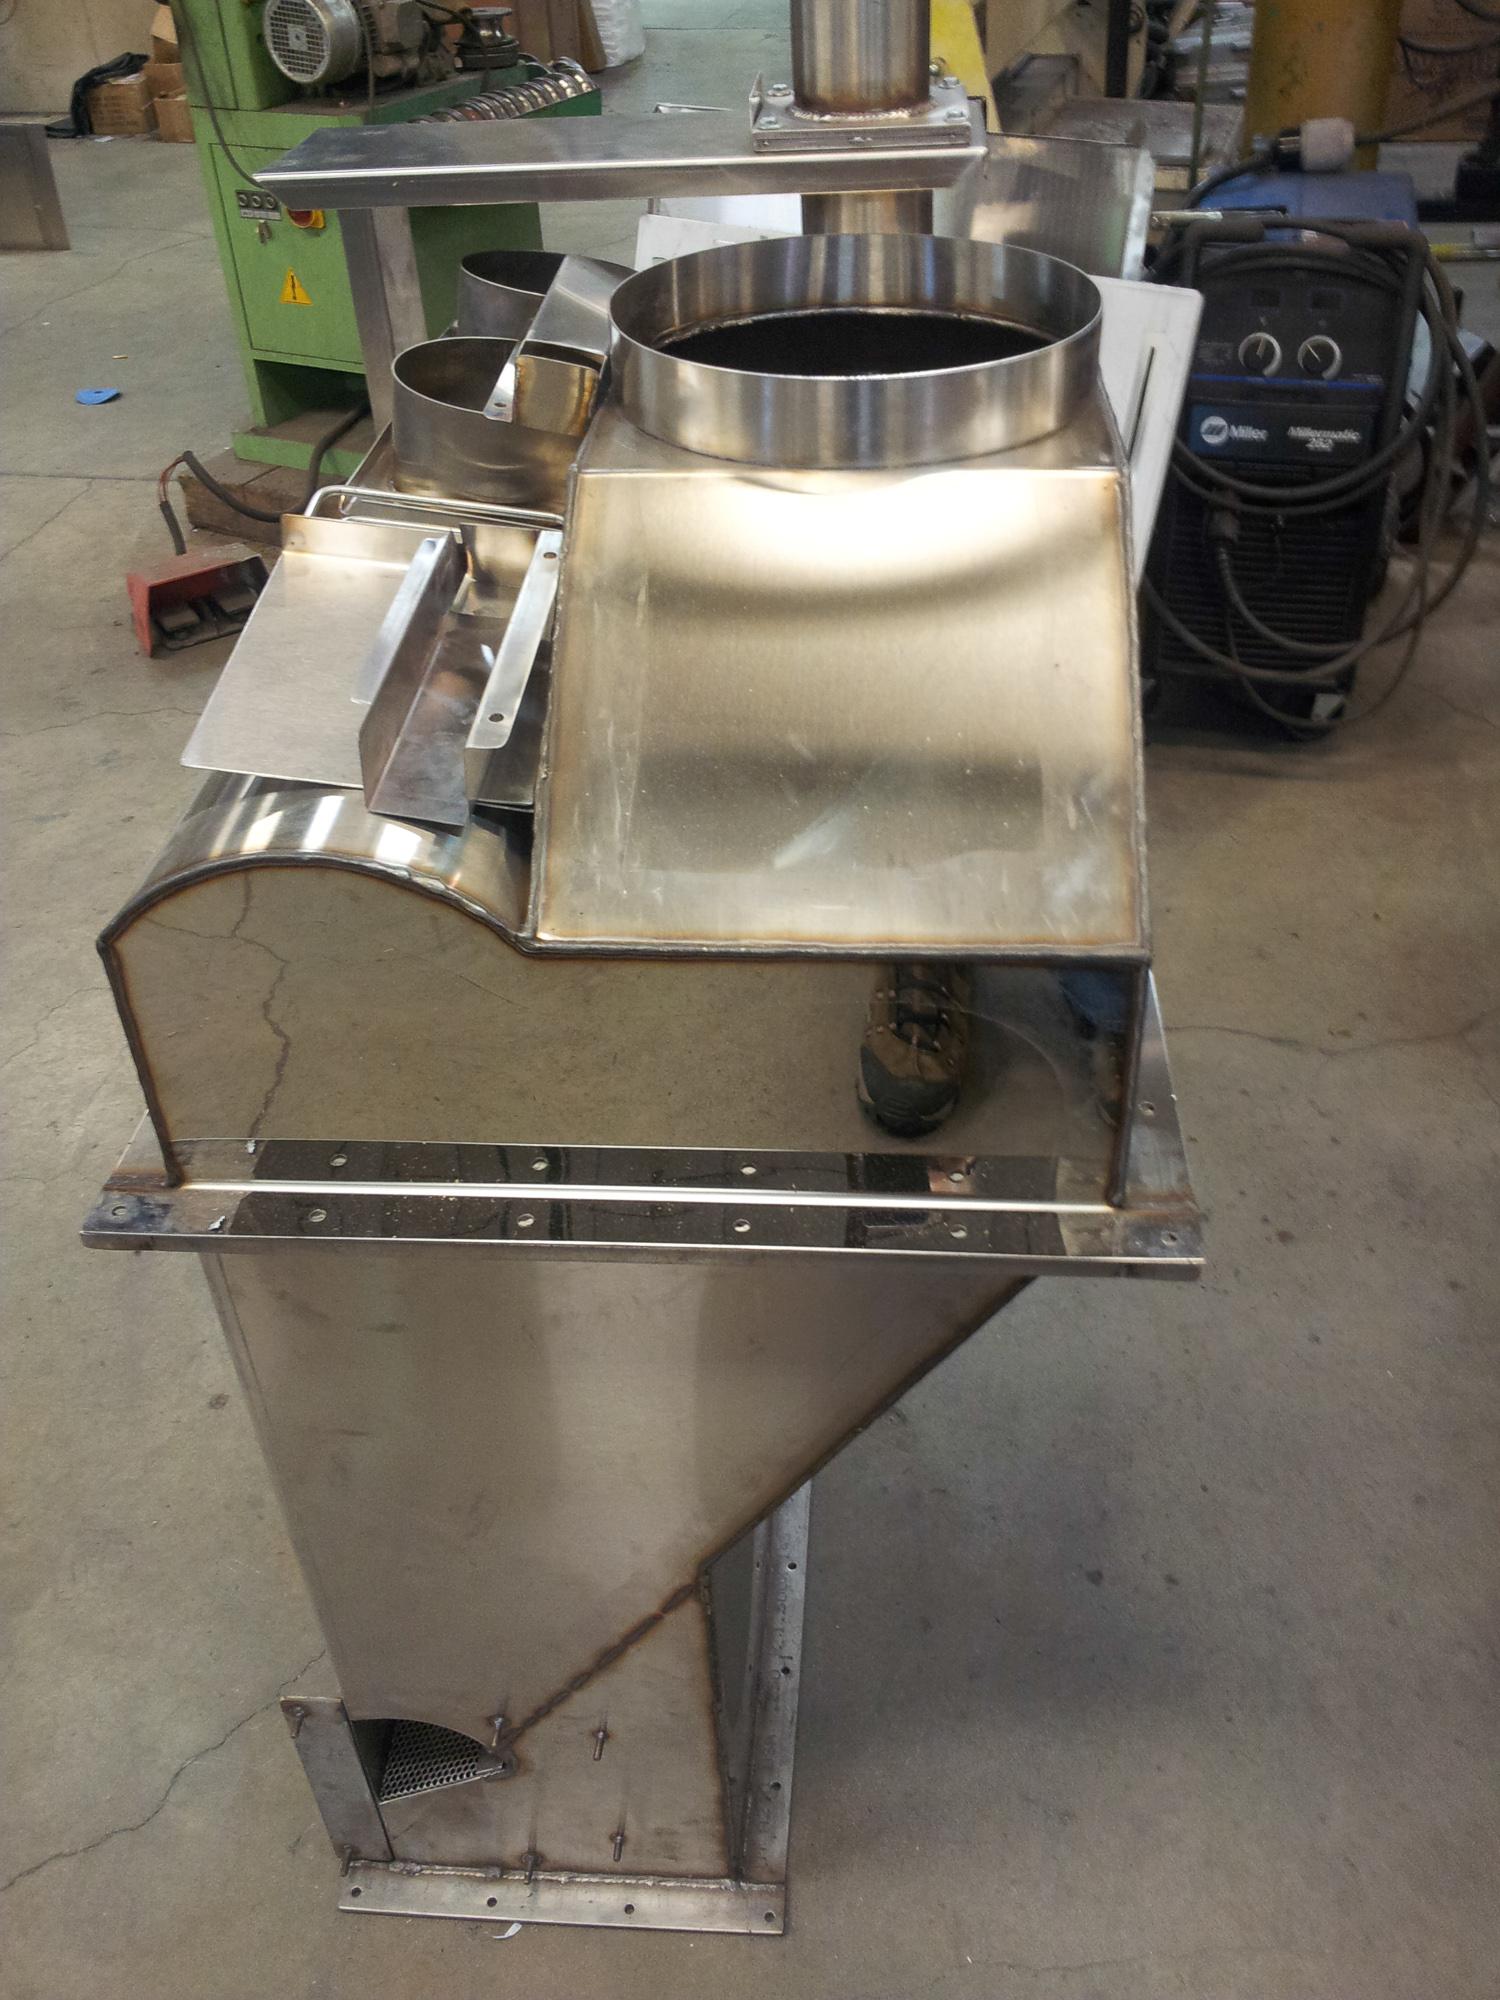 roaster20120328_093603.jpg